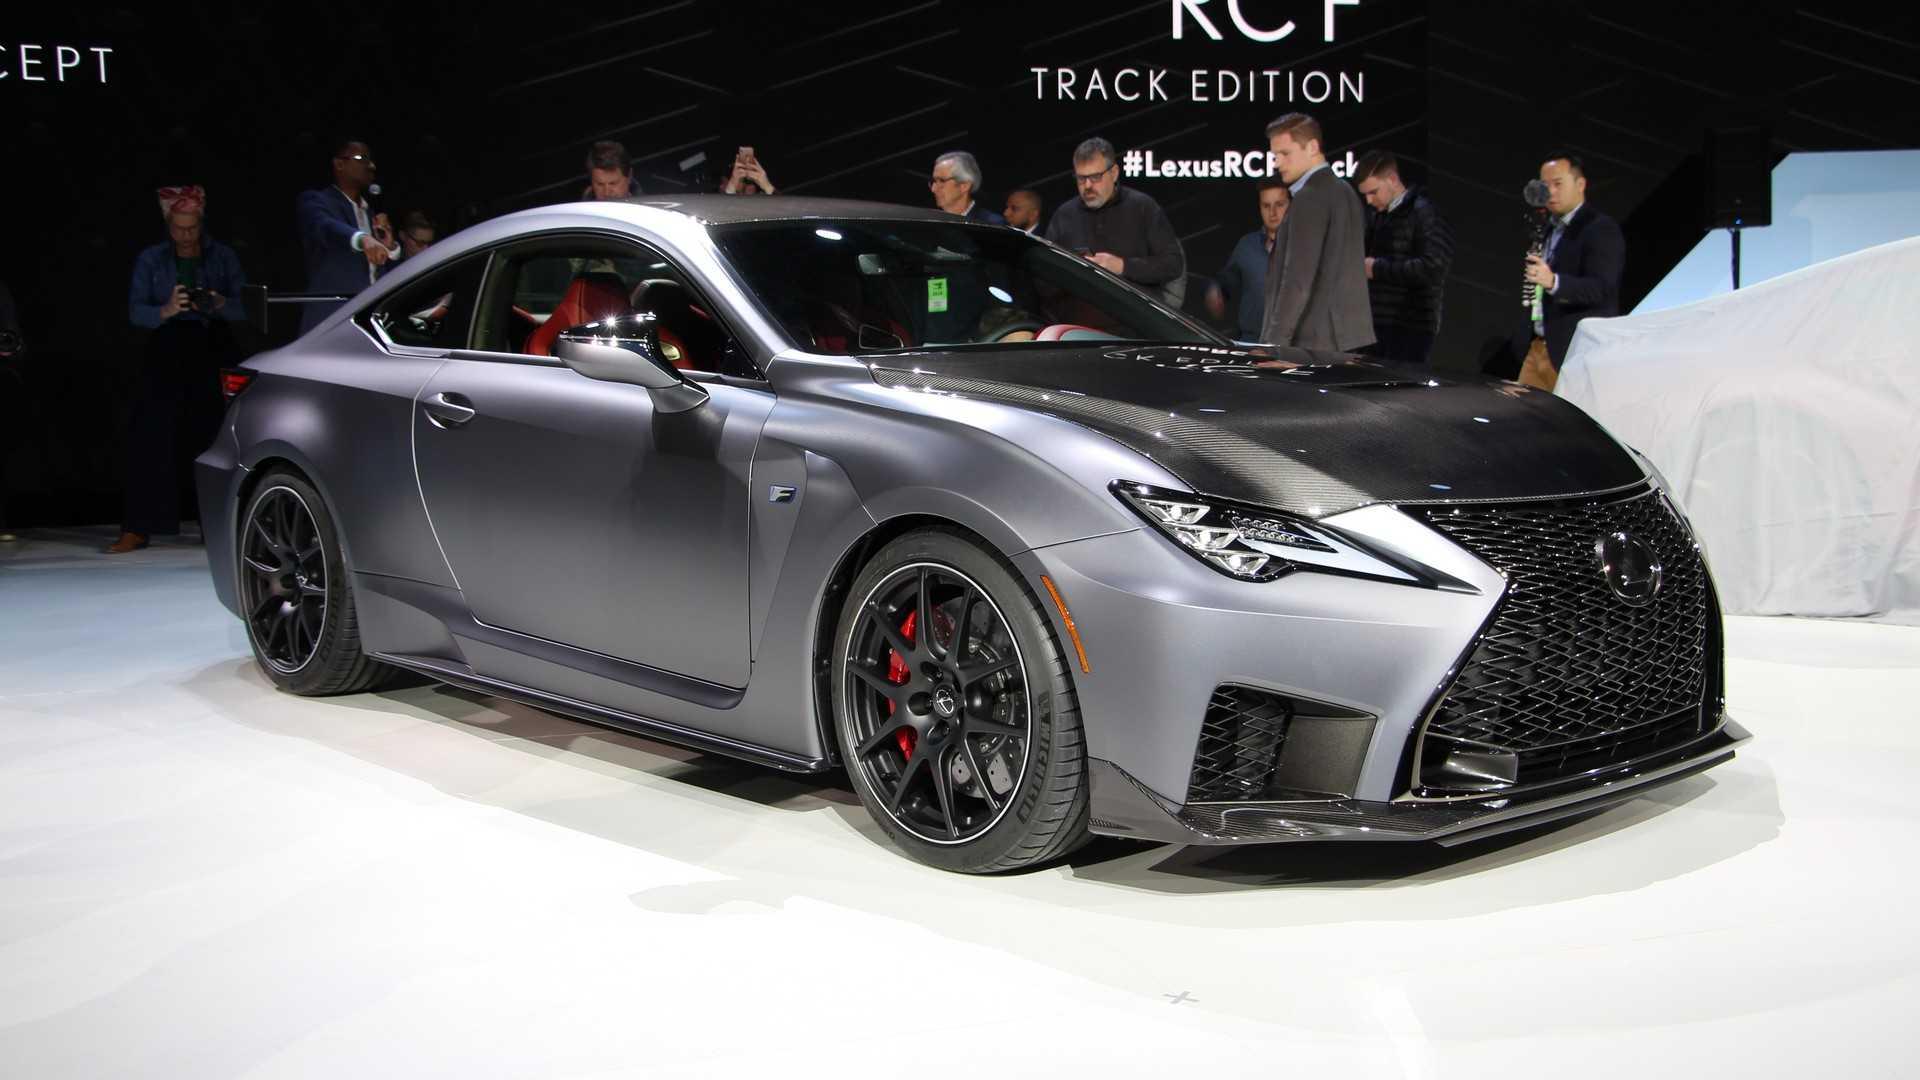 96 Gallery of Lexus 2020 Rc Speed Test for Lexus 2020 Rc